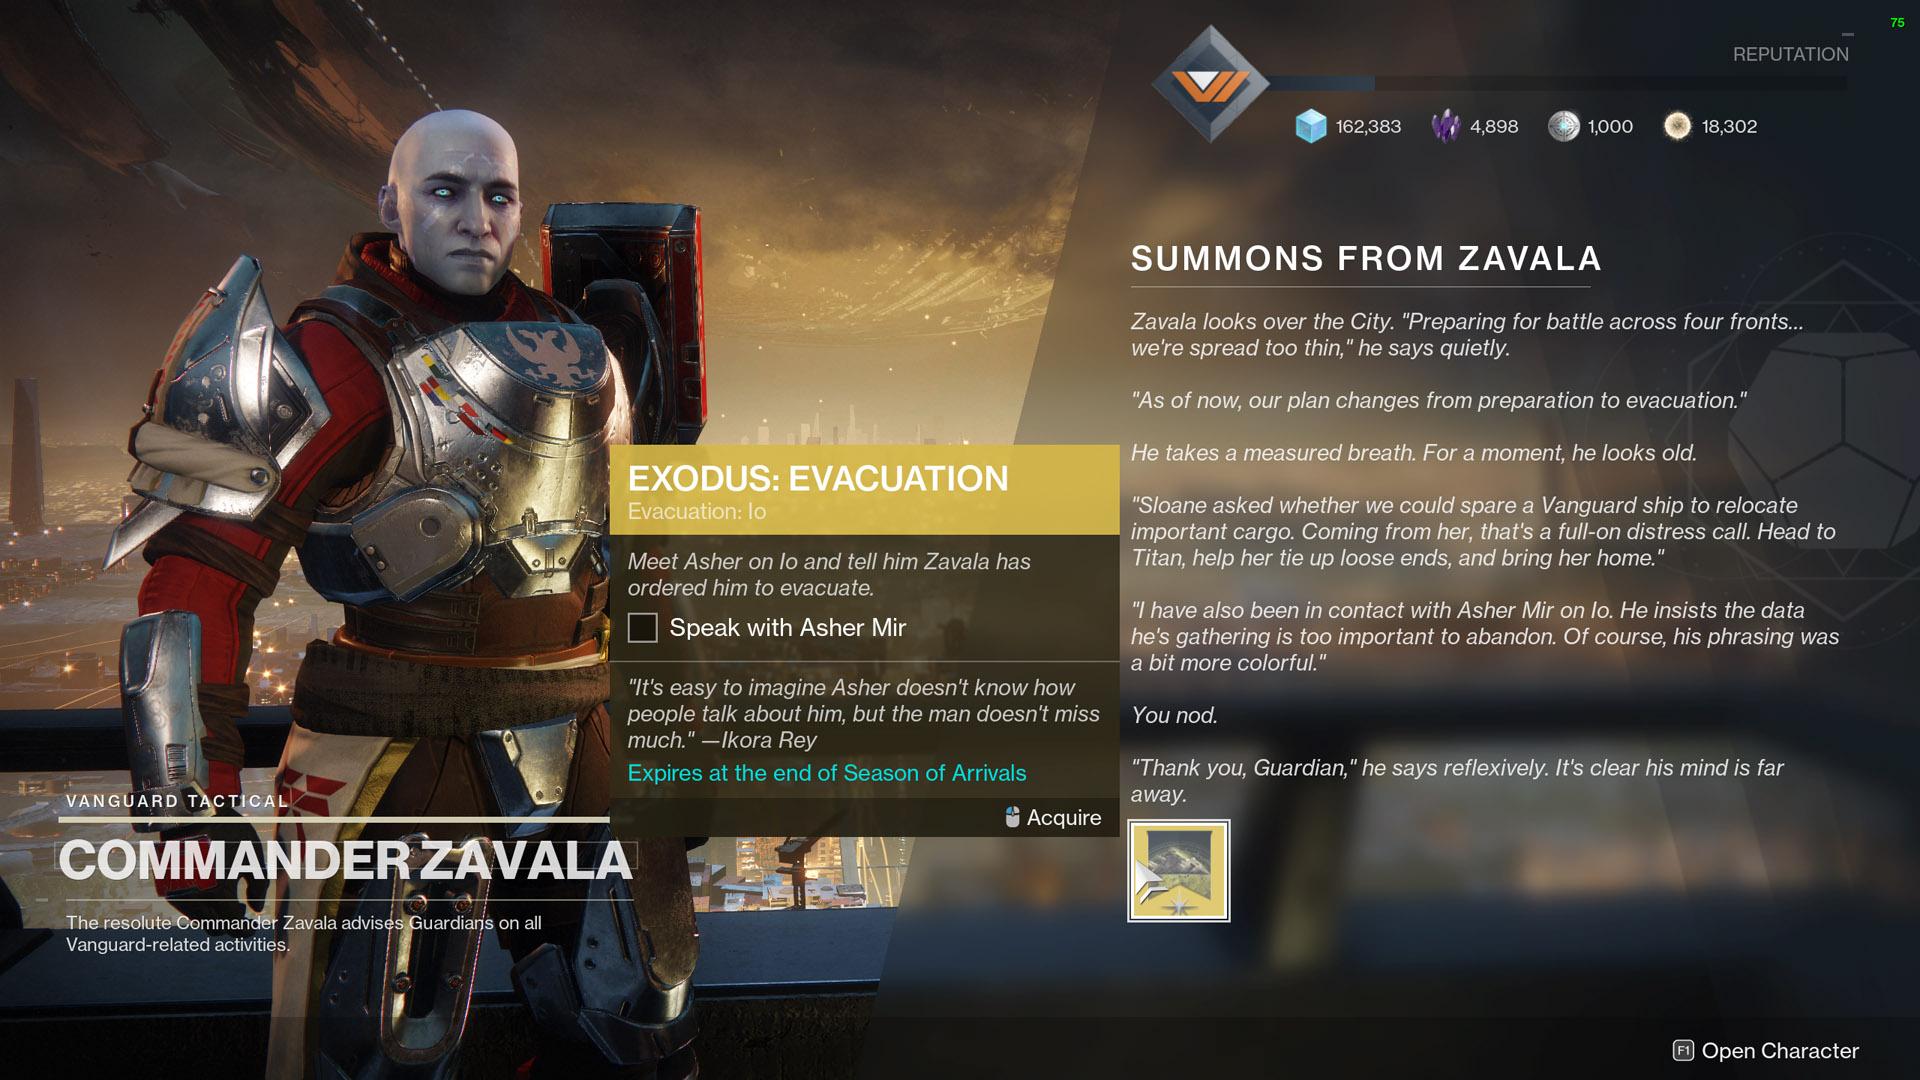 destiny 2 exodus evacuation